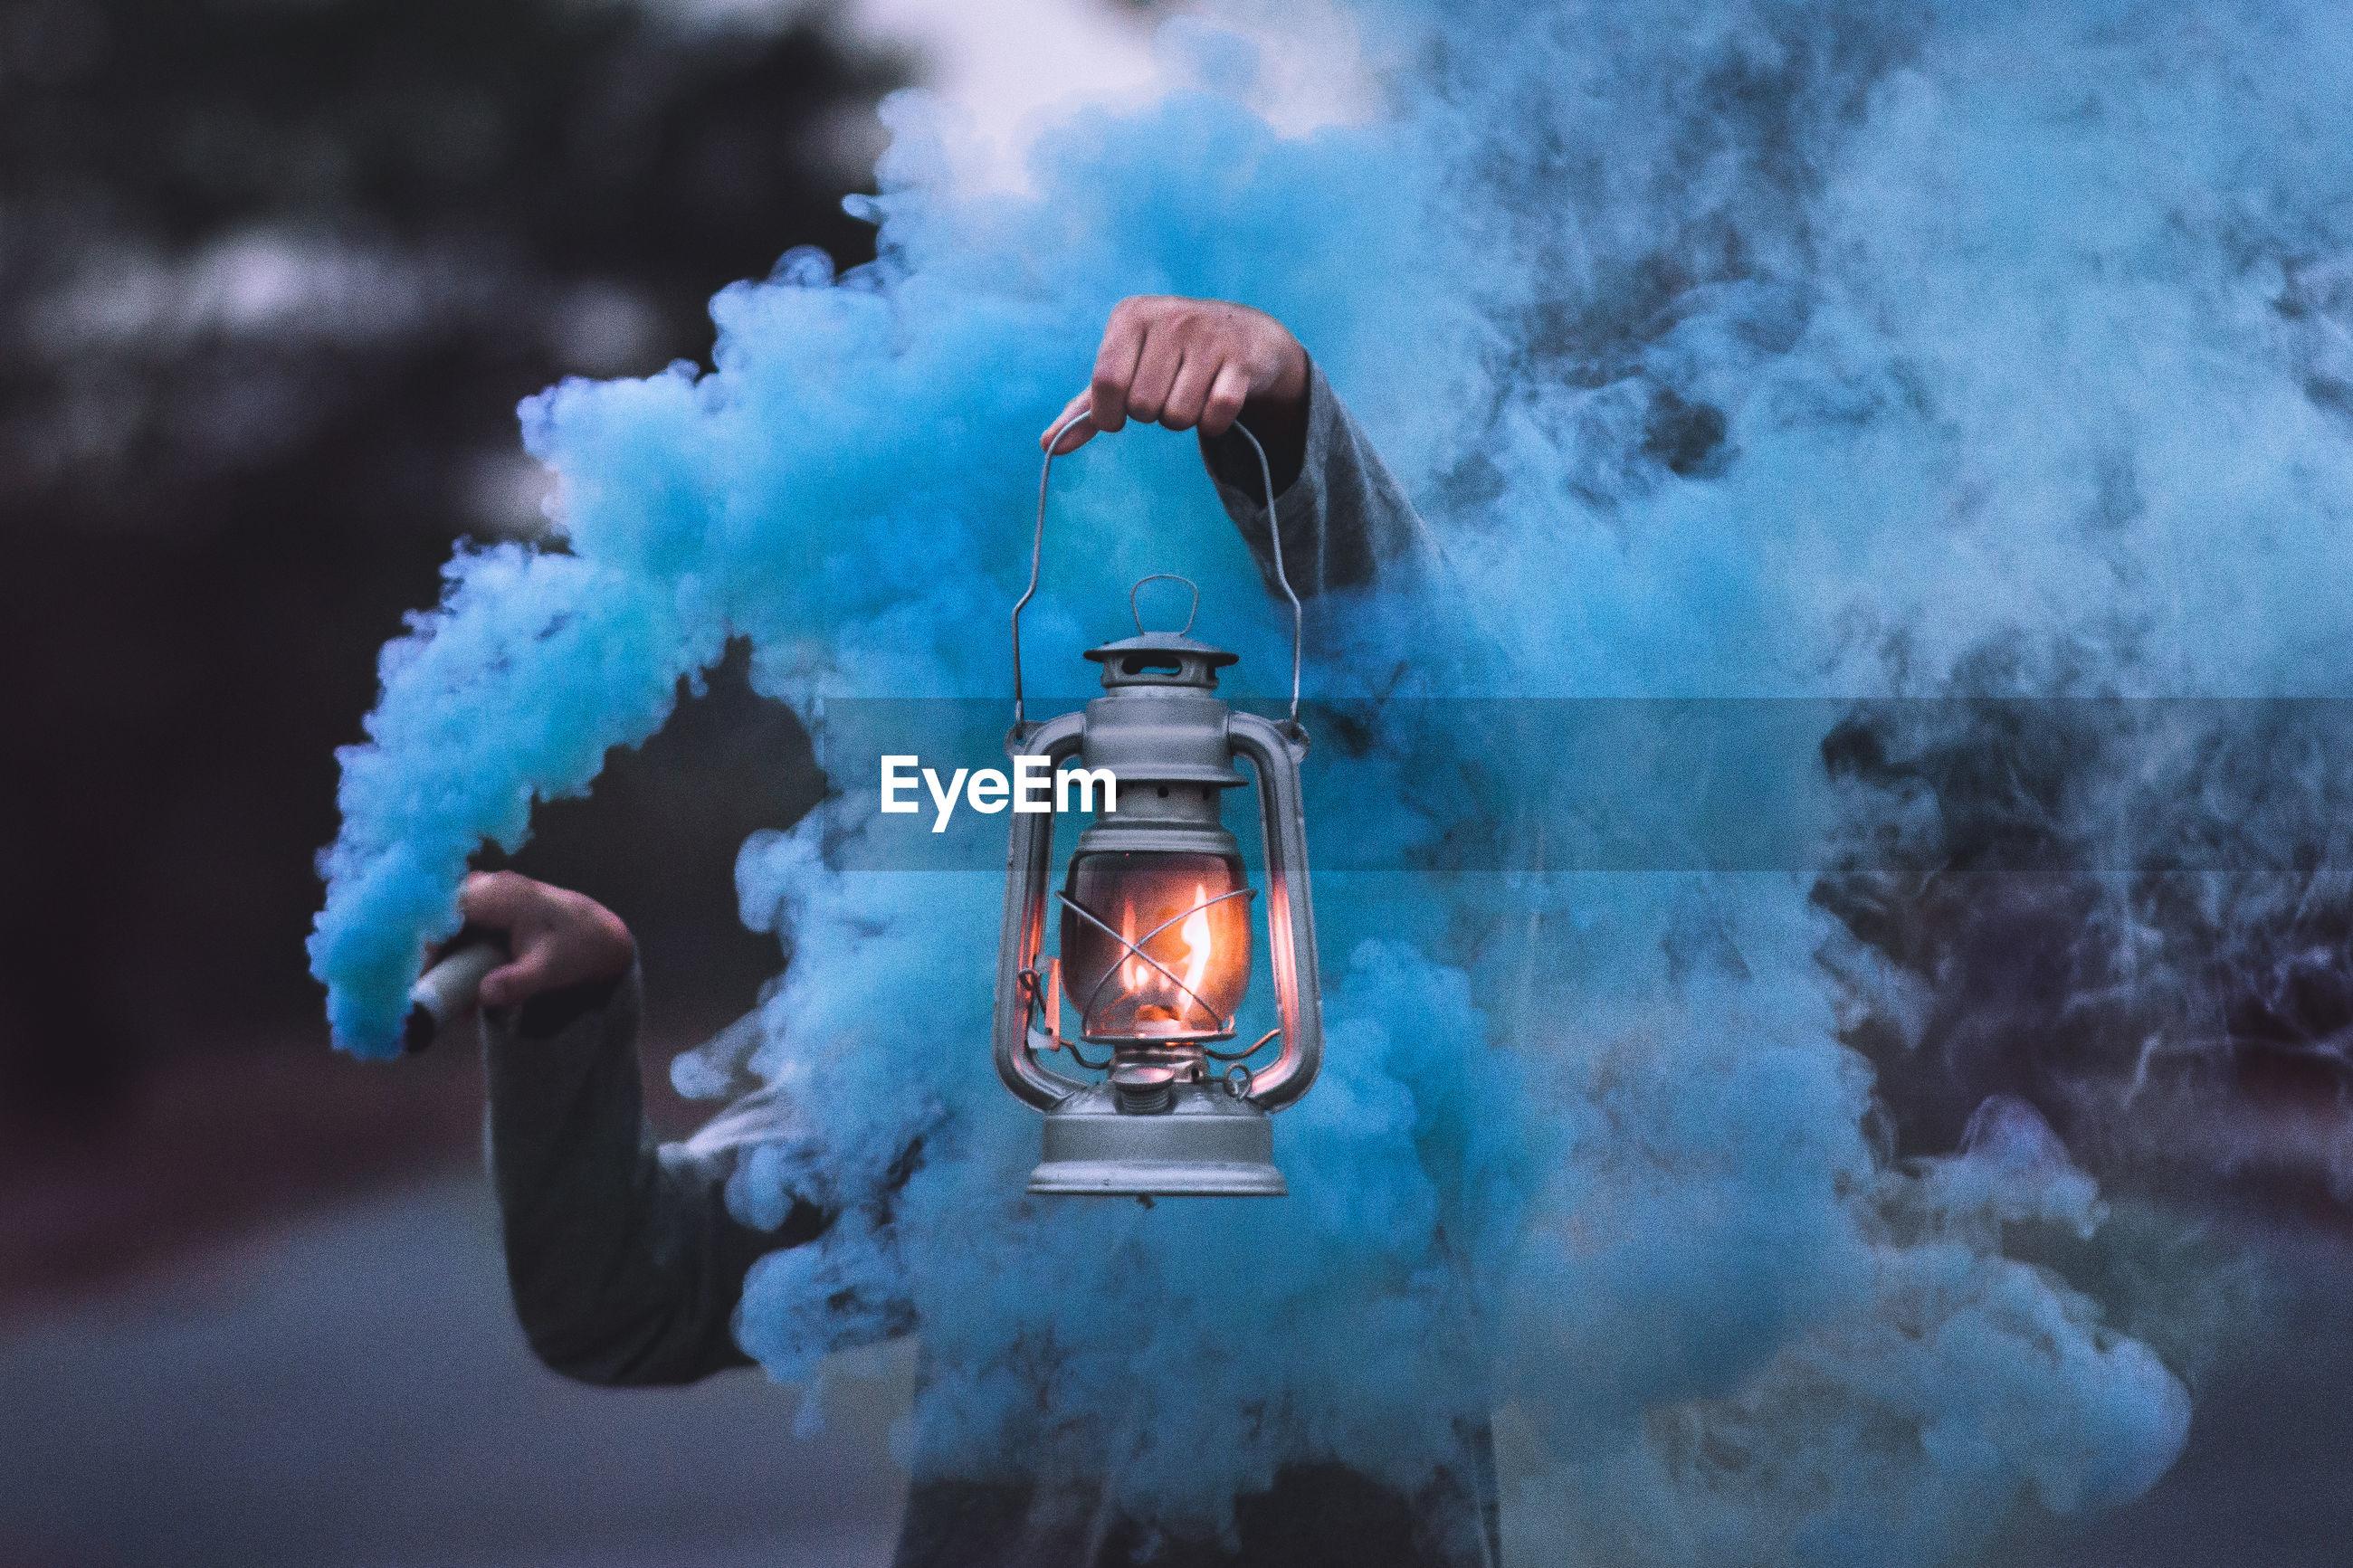 Person holding illuminated lantern amidst blue smoke